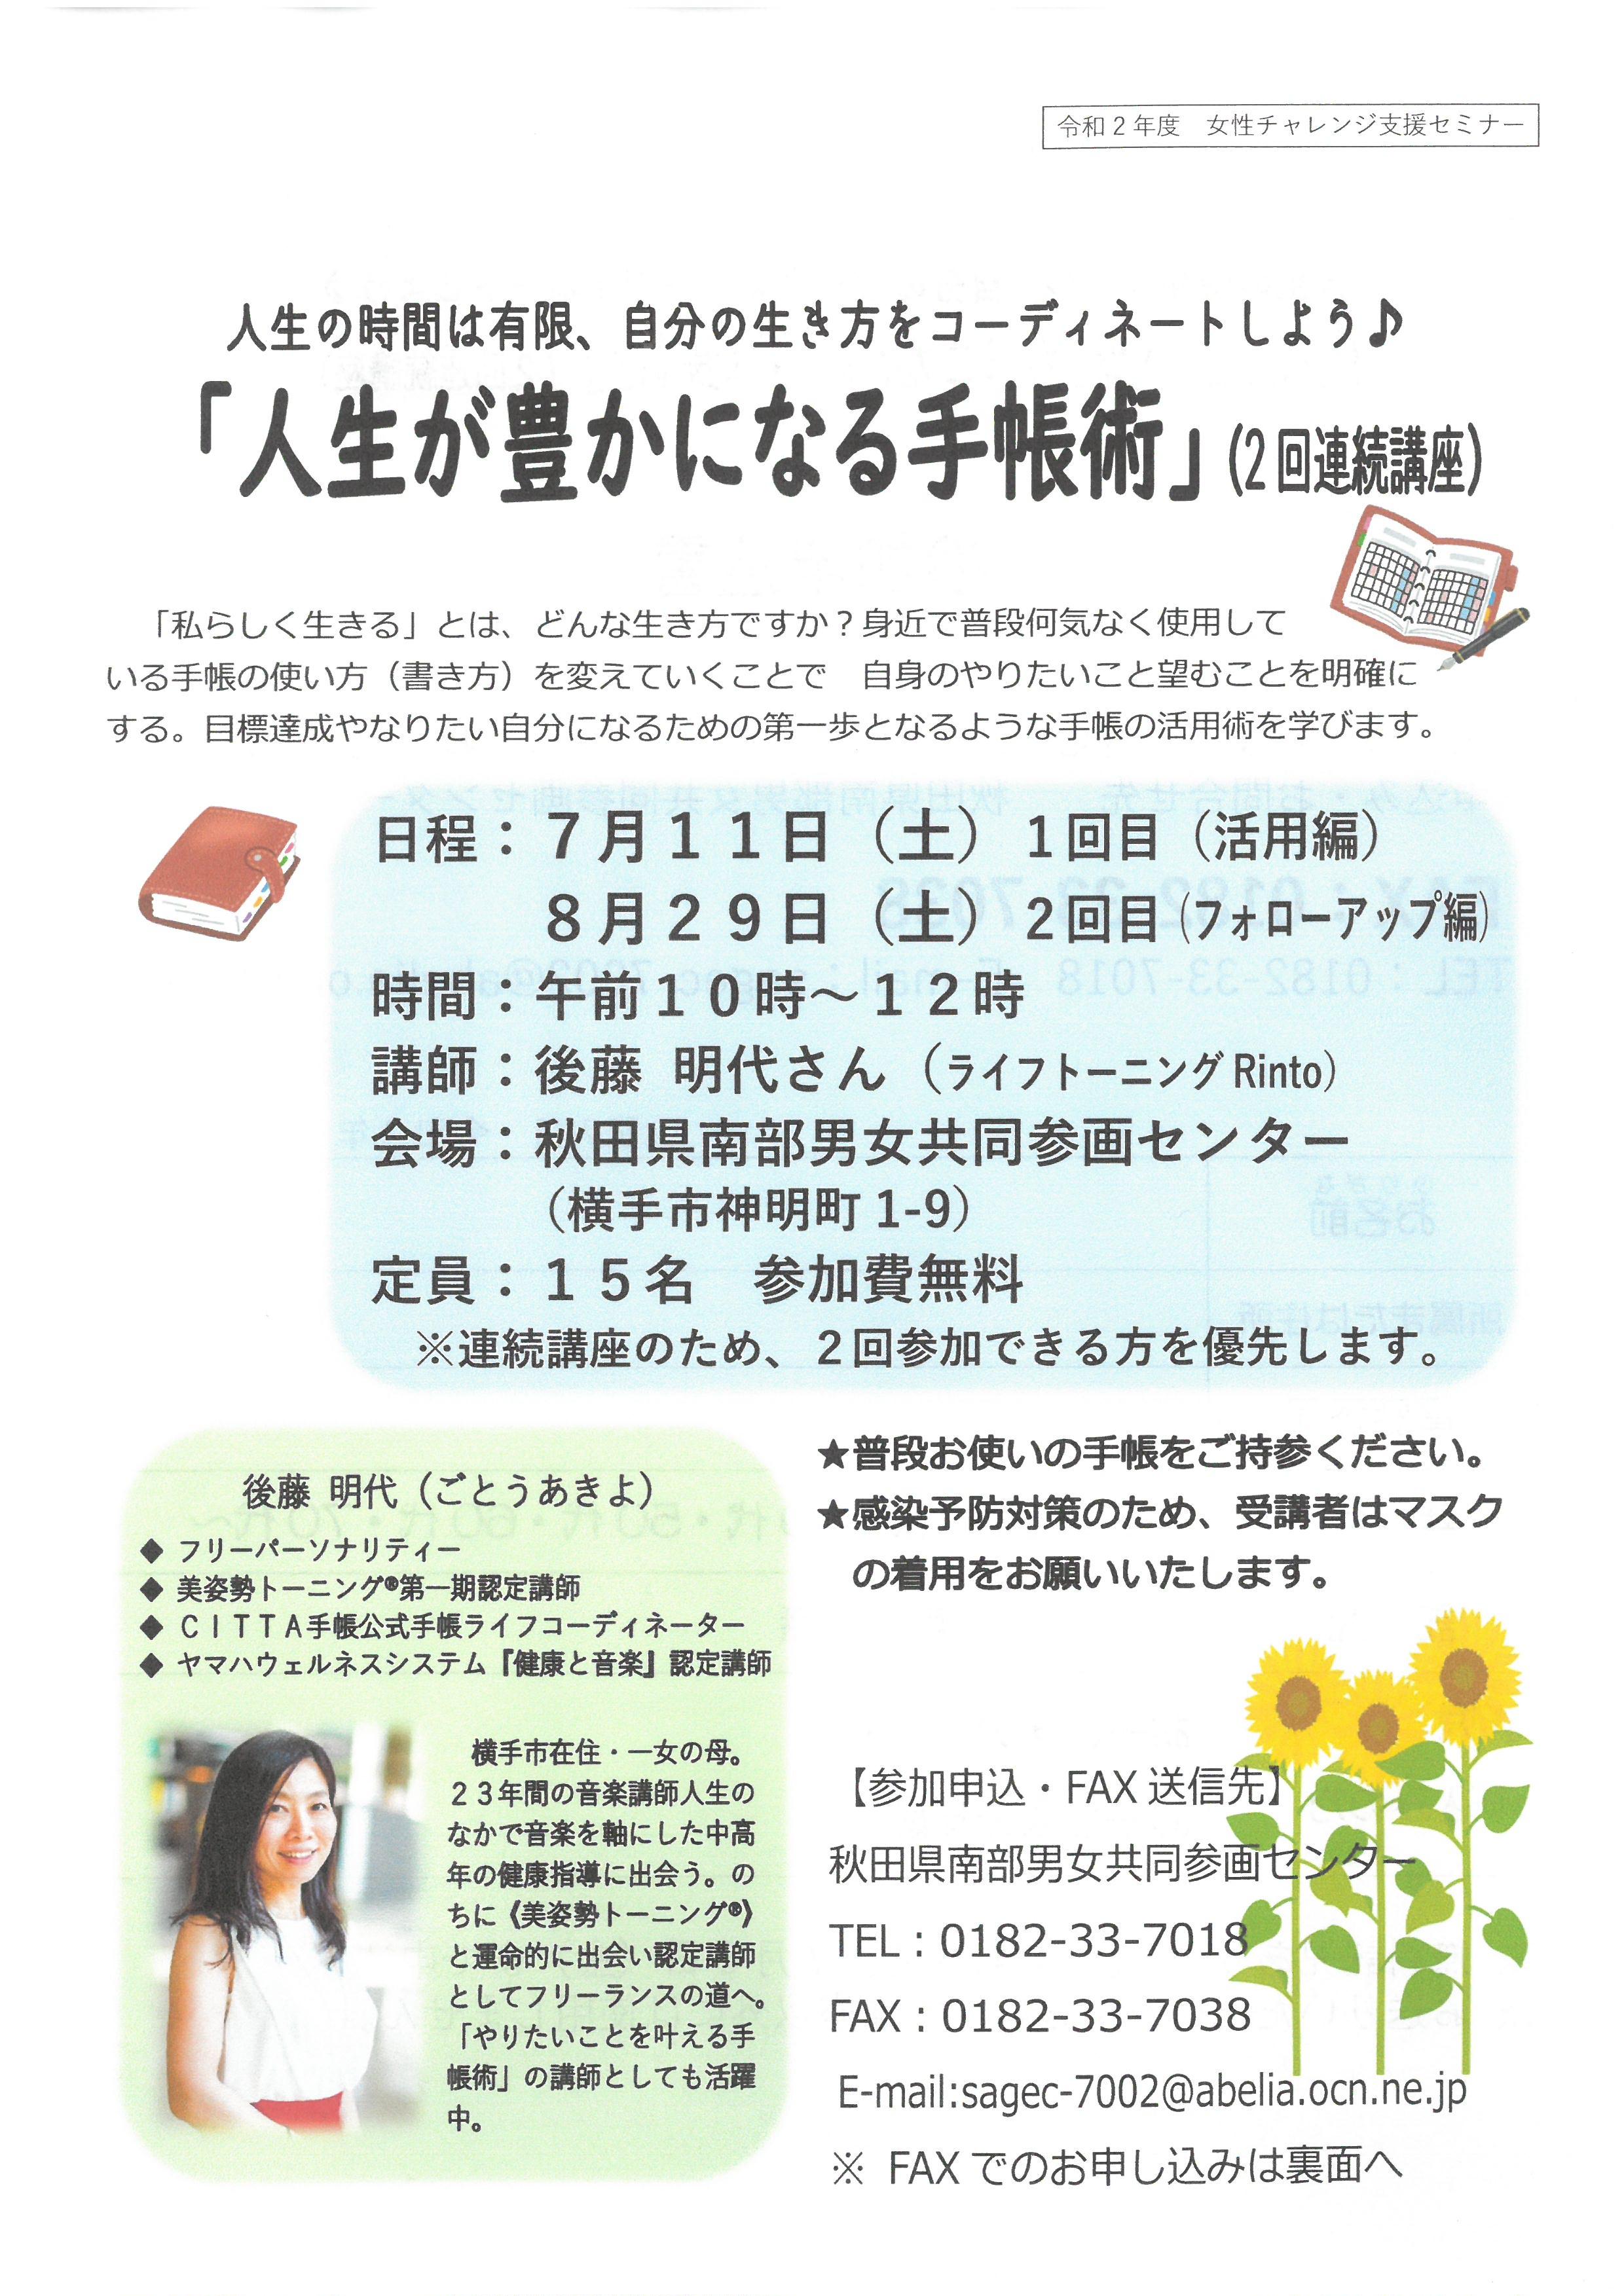 http://www.akita-south-jender.org/news/SKM_C25820061209290.jpg